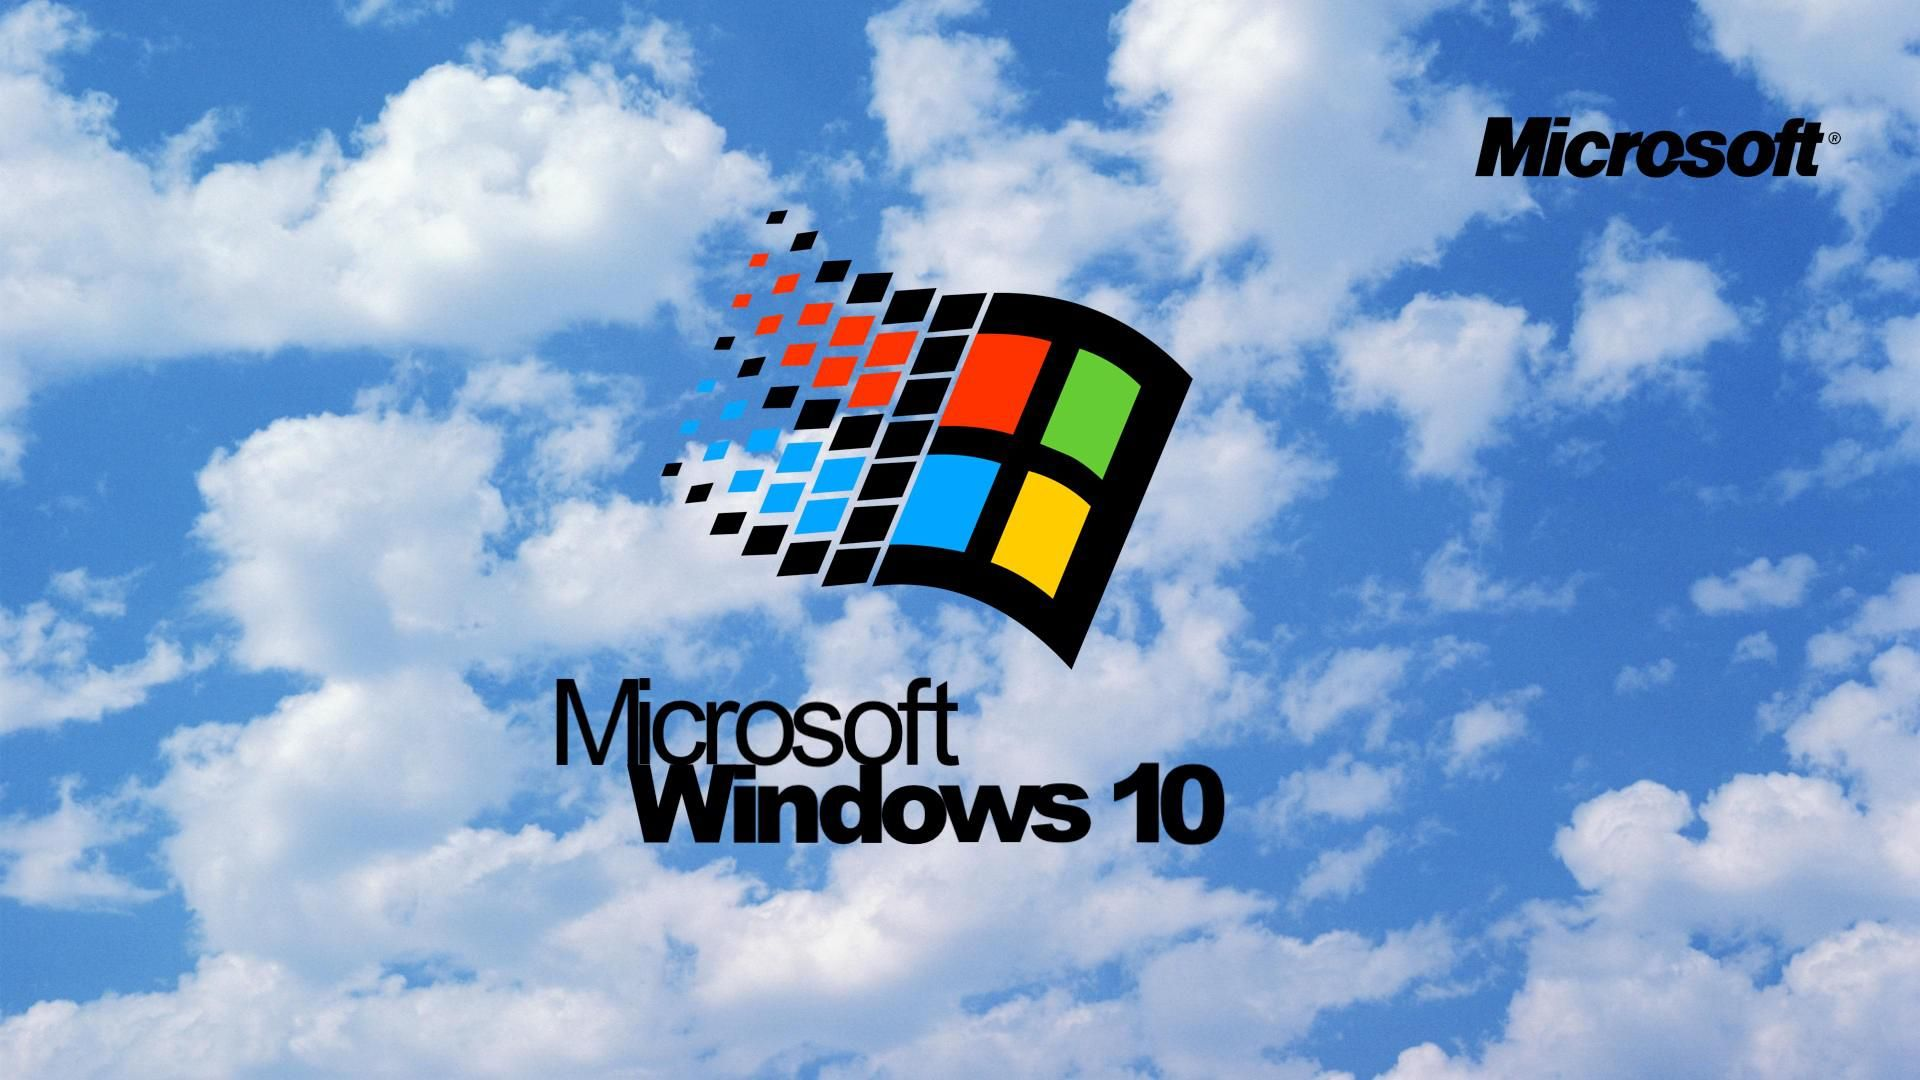 Windows 10 Background Image Location Registry